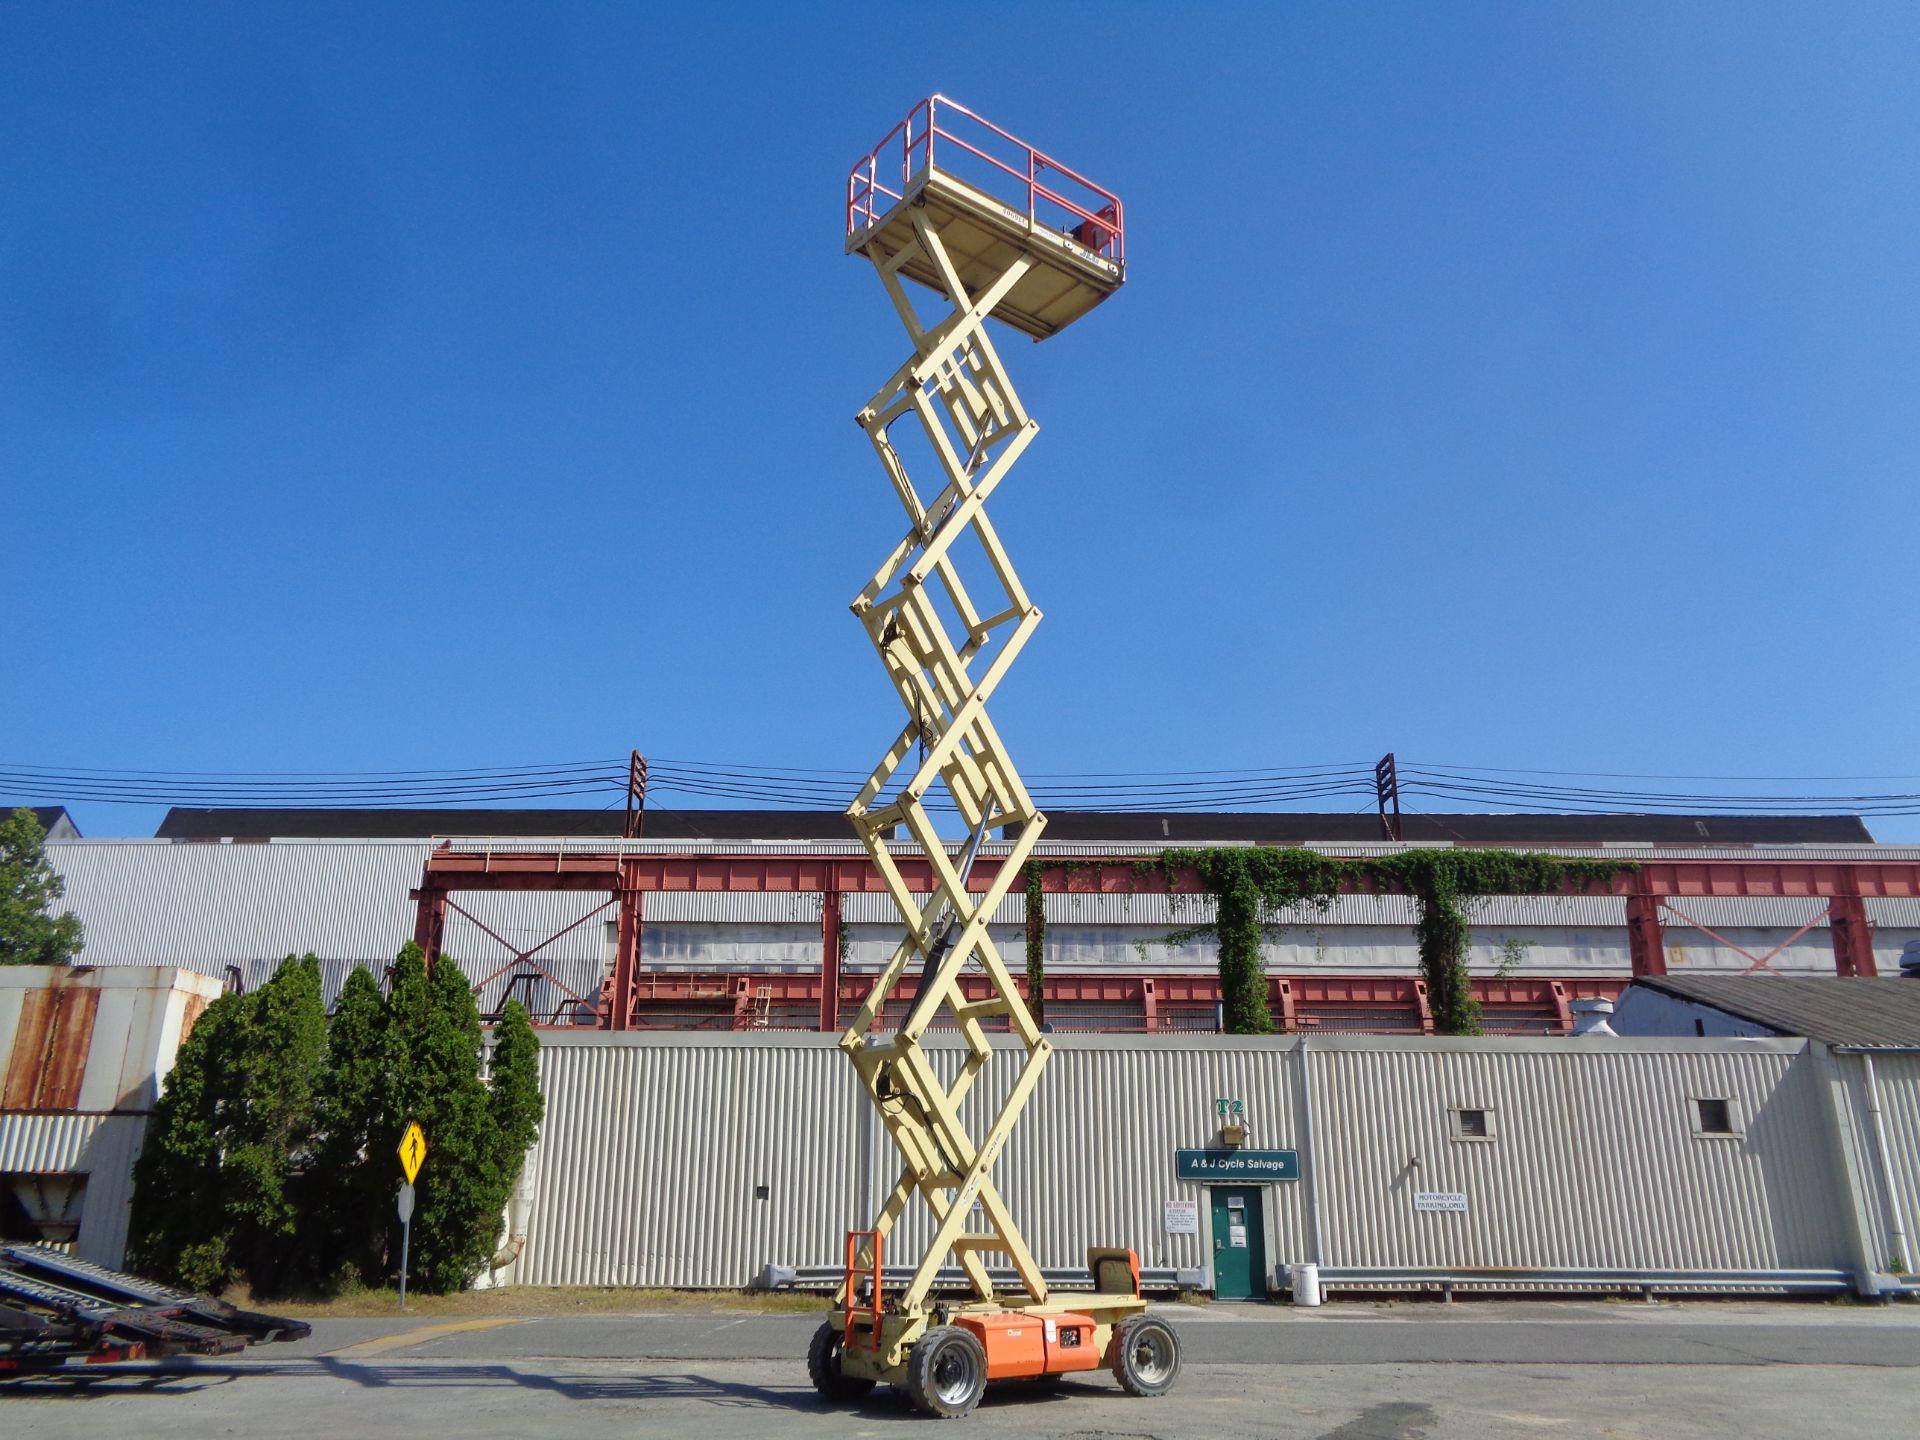 Lot 47 - 2012 JLG 4069LE 40ft Electric Scissor Lift